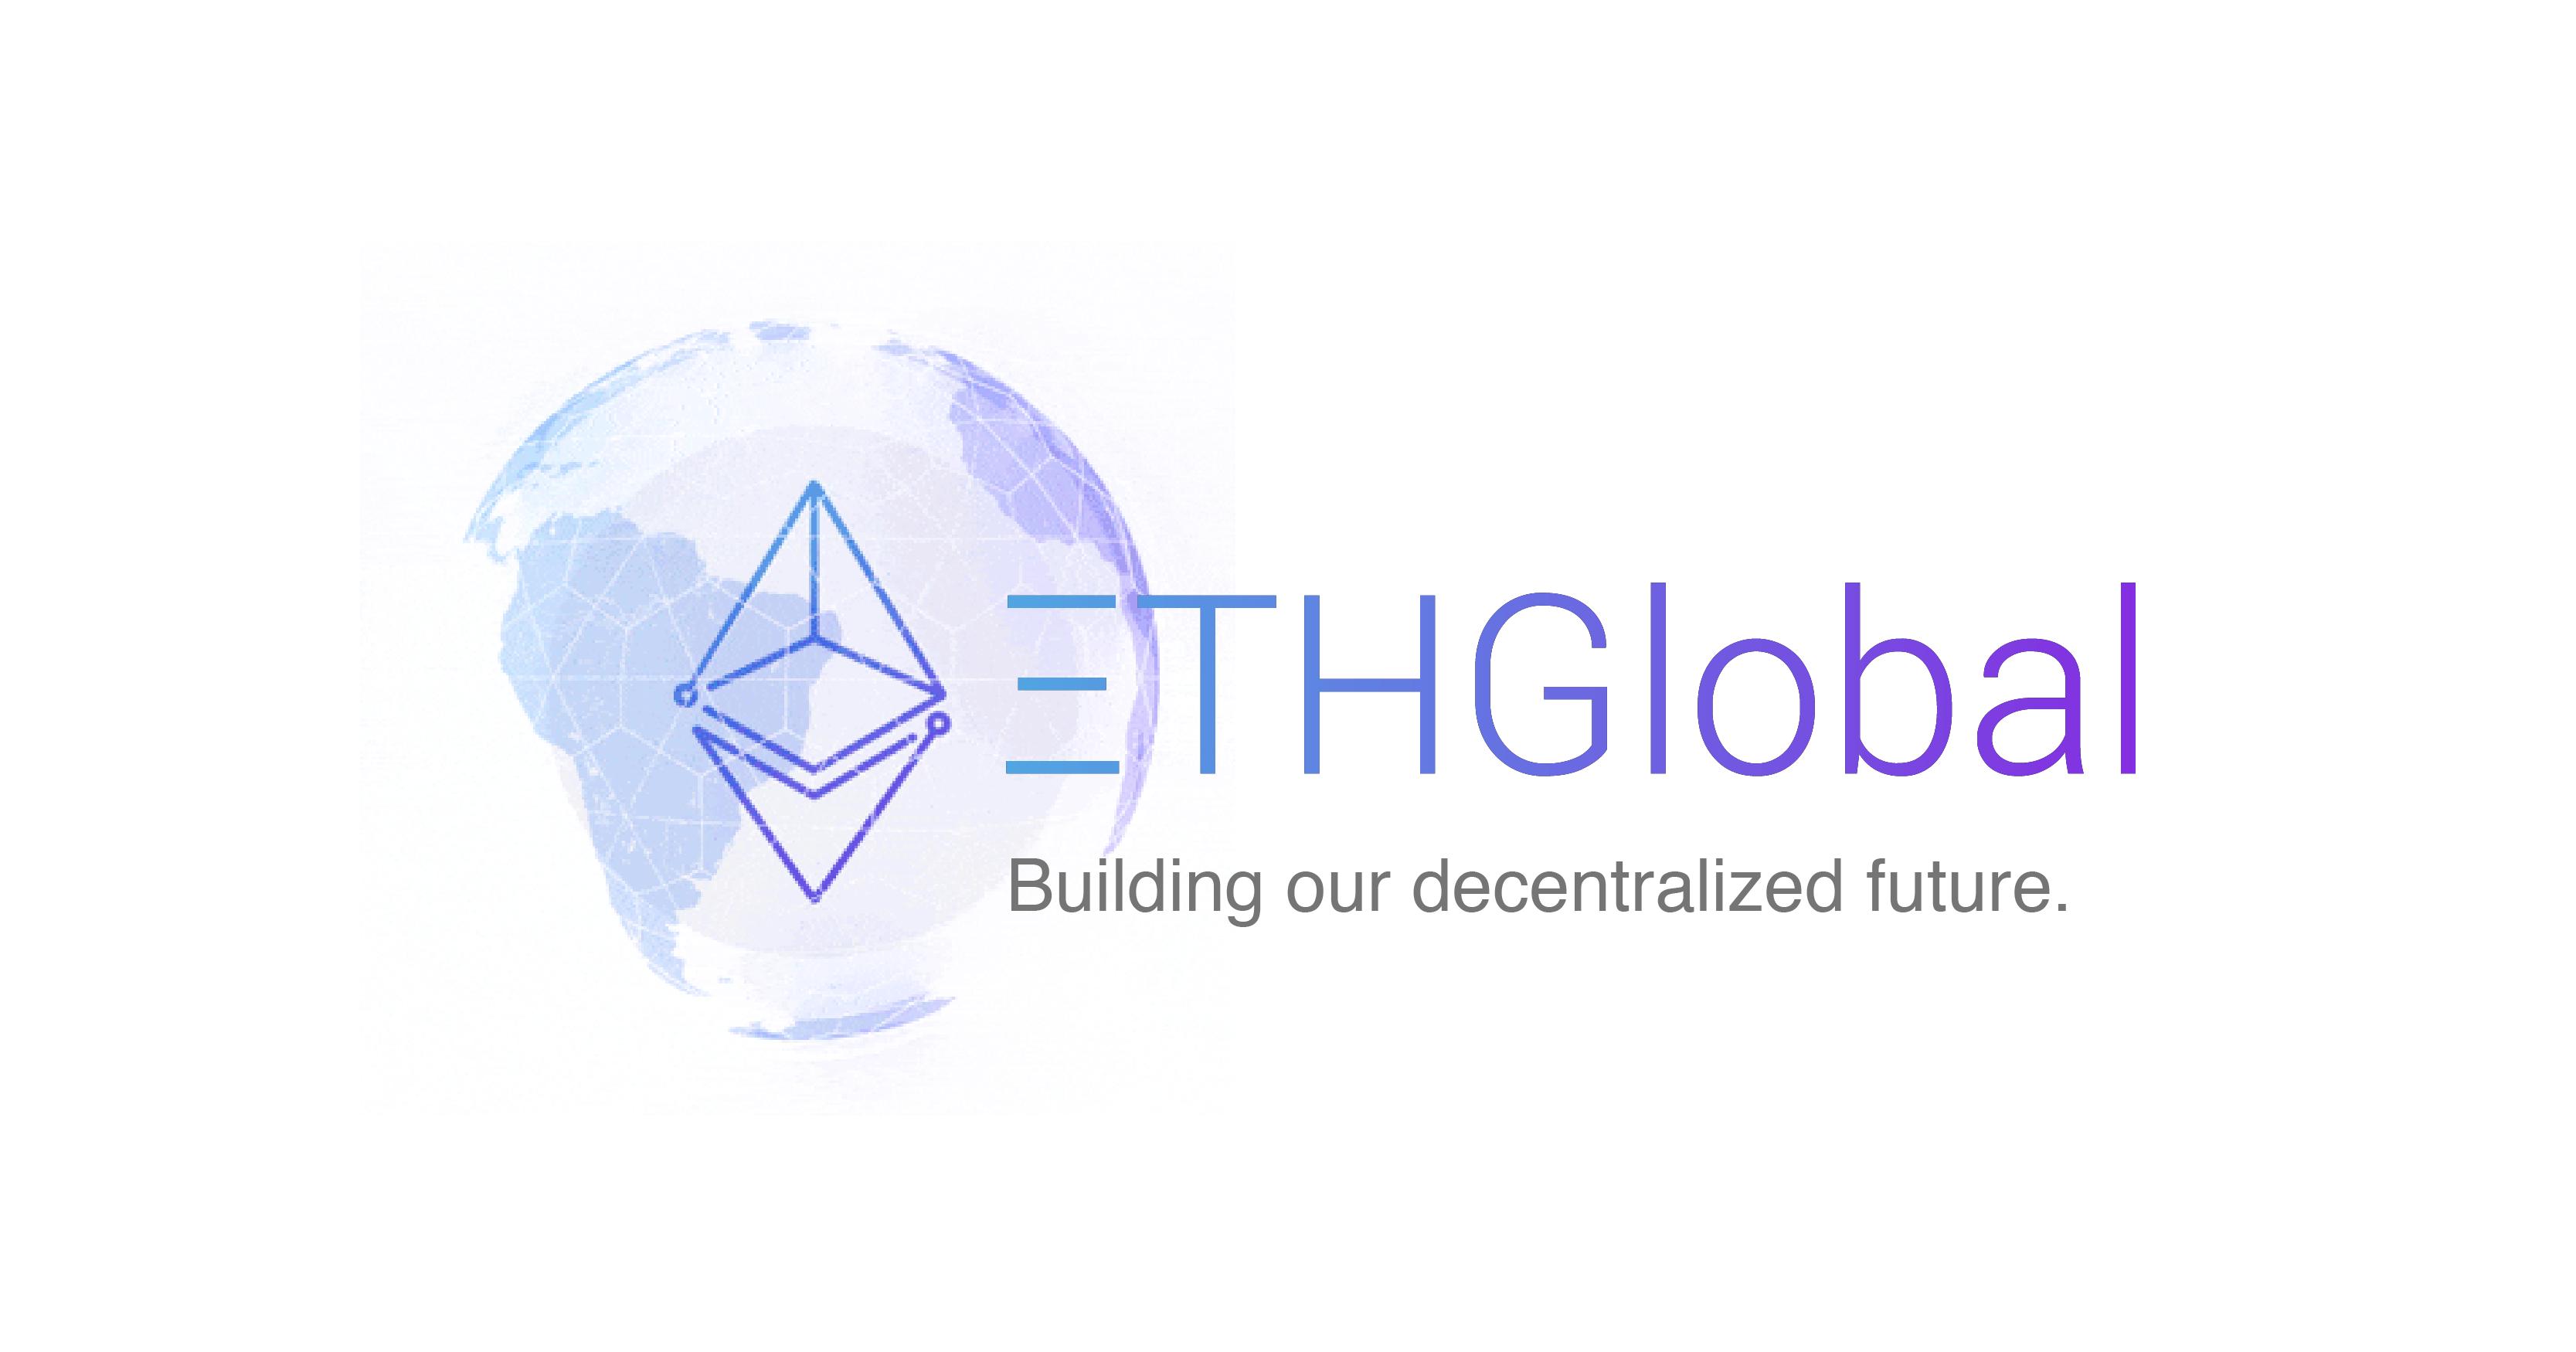 facebook share large - The World's Biggest Ethereum Hackathon Comes To San Francisco In October